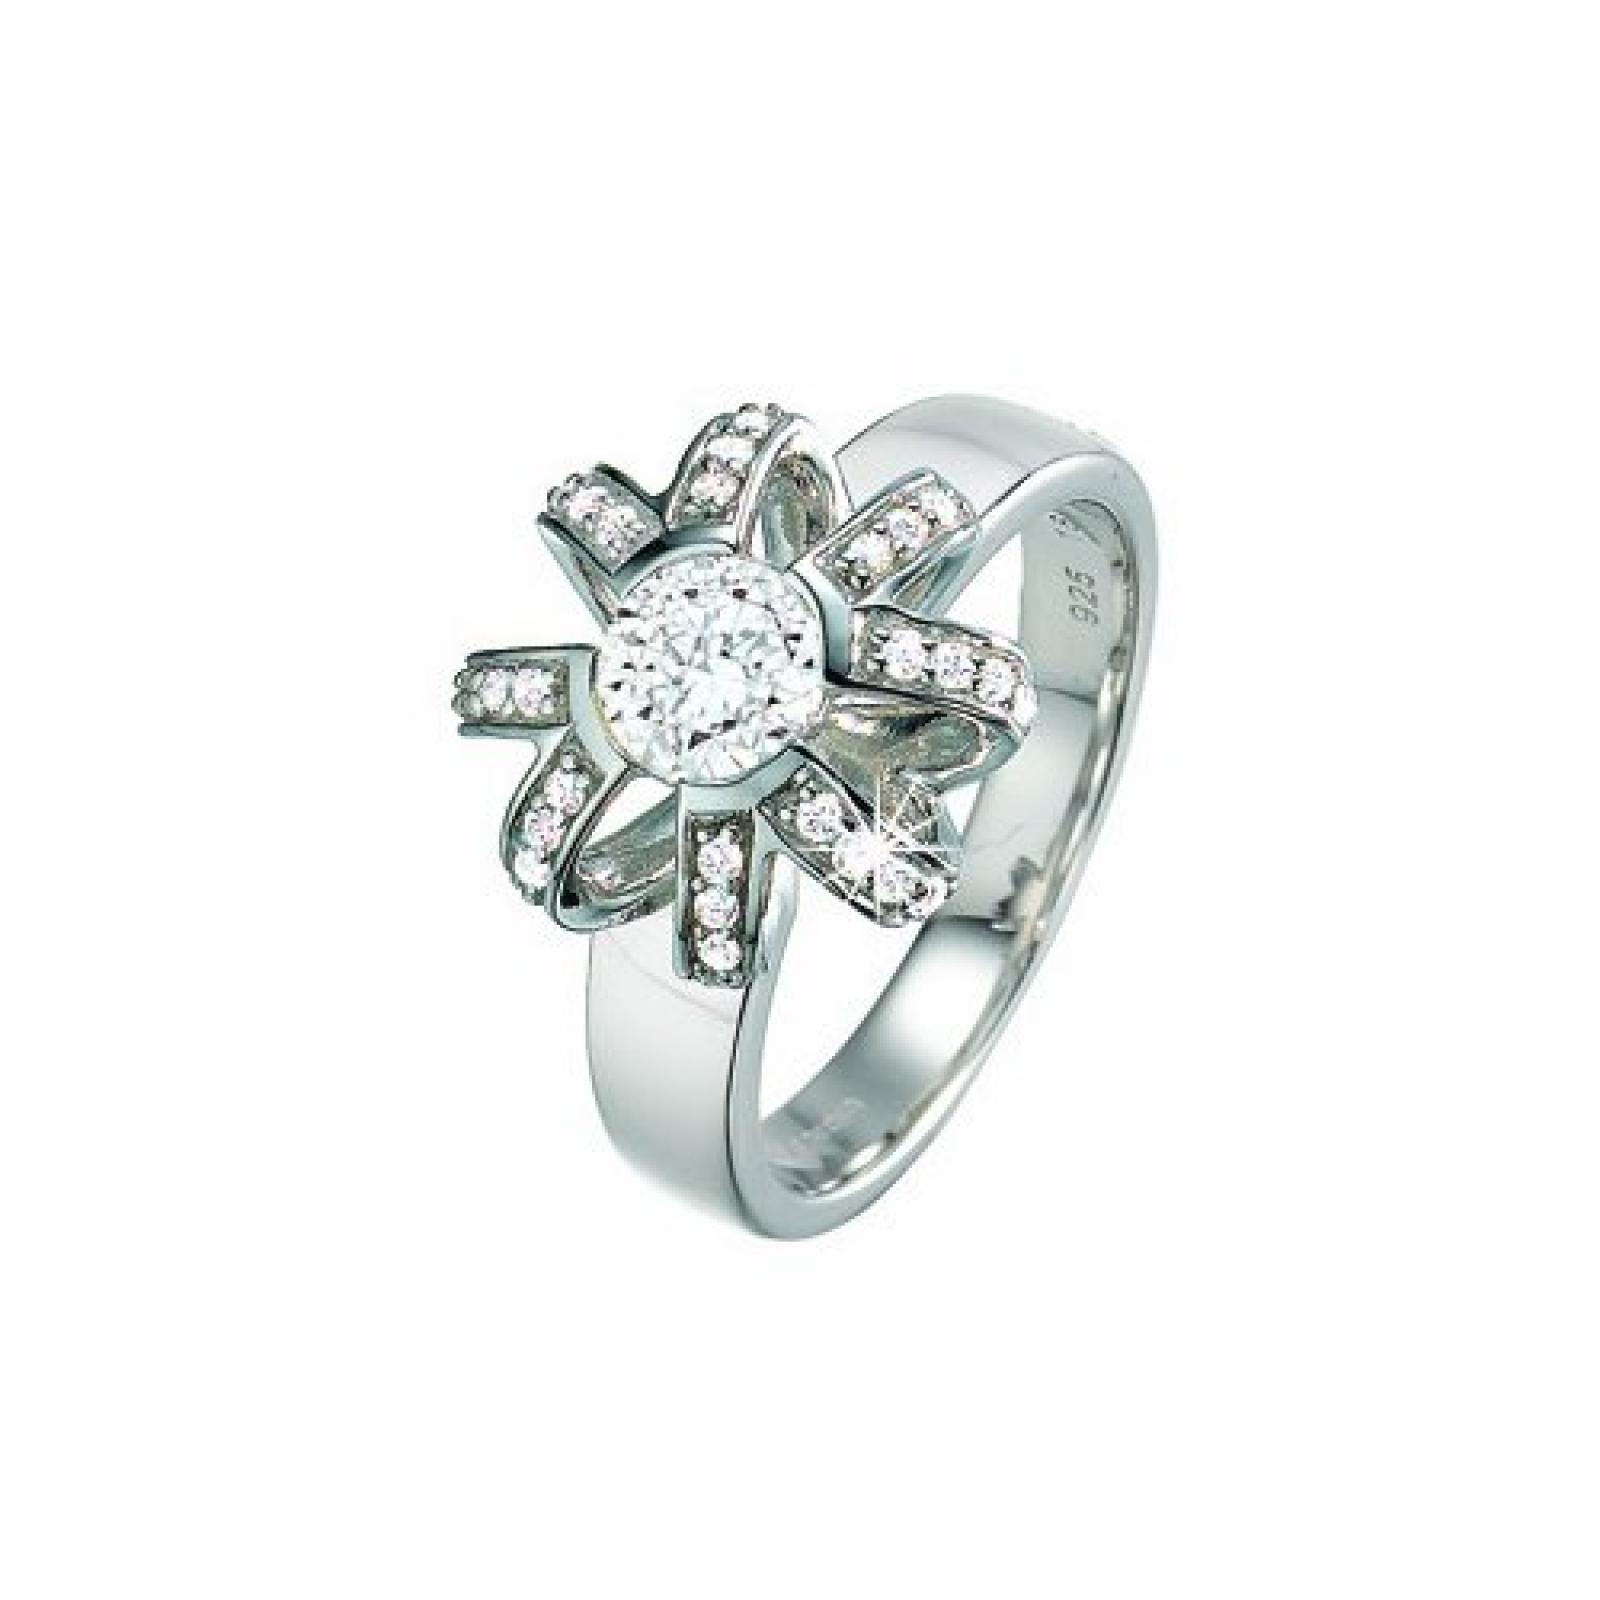 Pierre Cardin Damen-Ring Marguerite Sterling-Silber 925 PCRG90296A